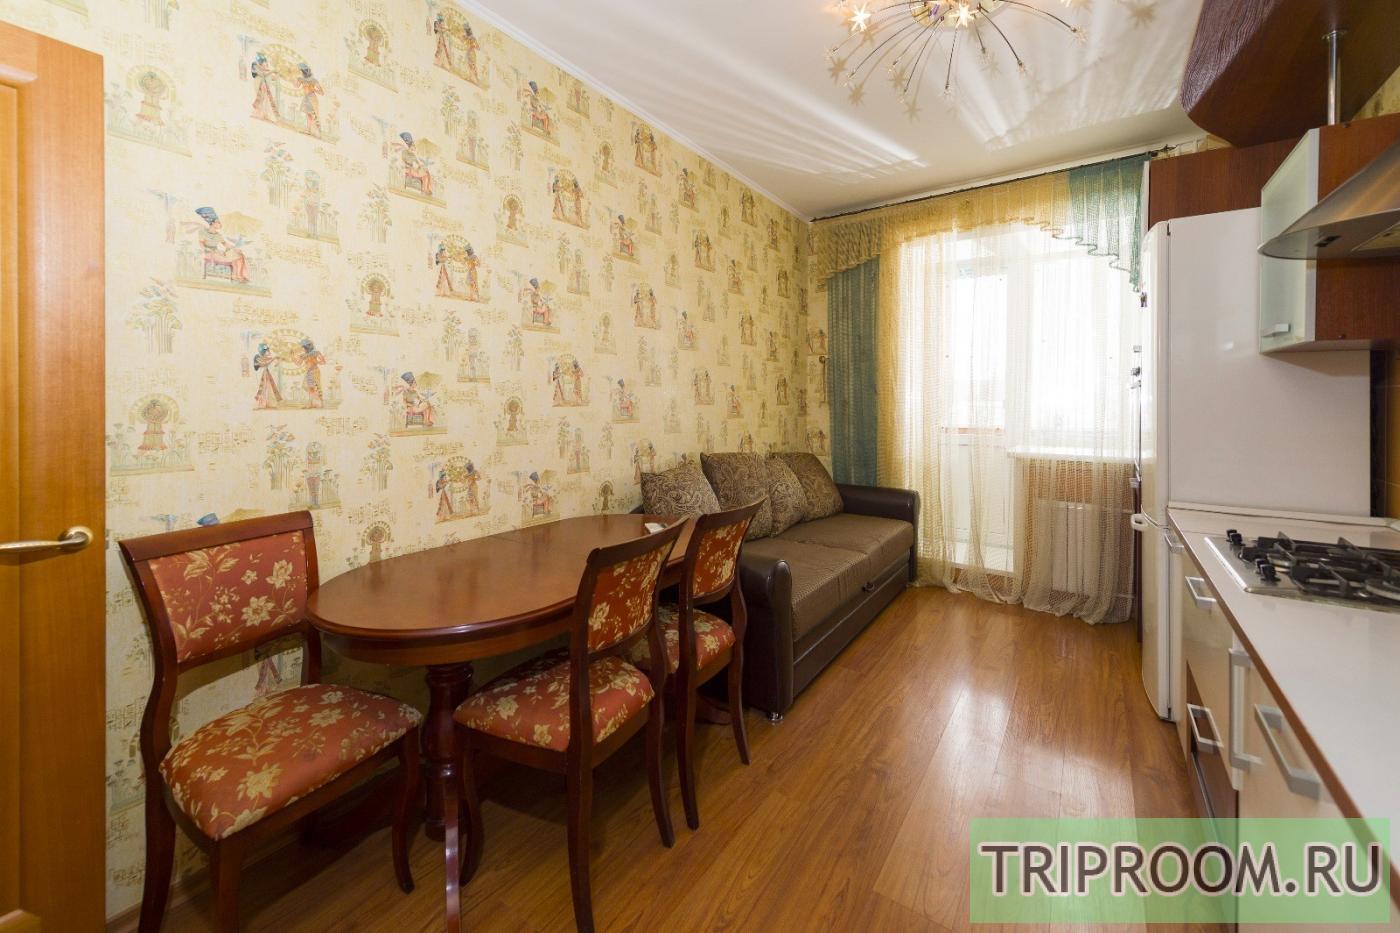 2-комнатная квартира посуточно (вариант № 2850), ул. Габдуллы Тукая улица, фото № 3